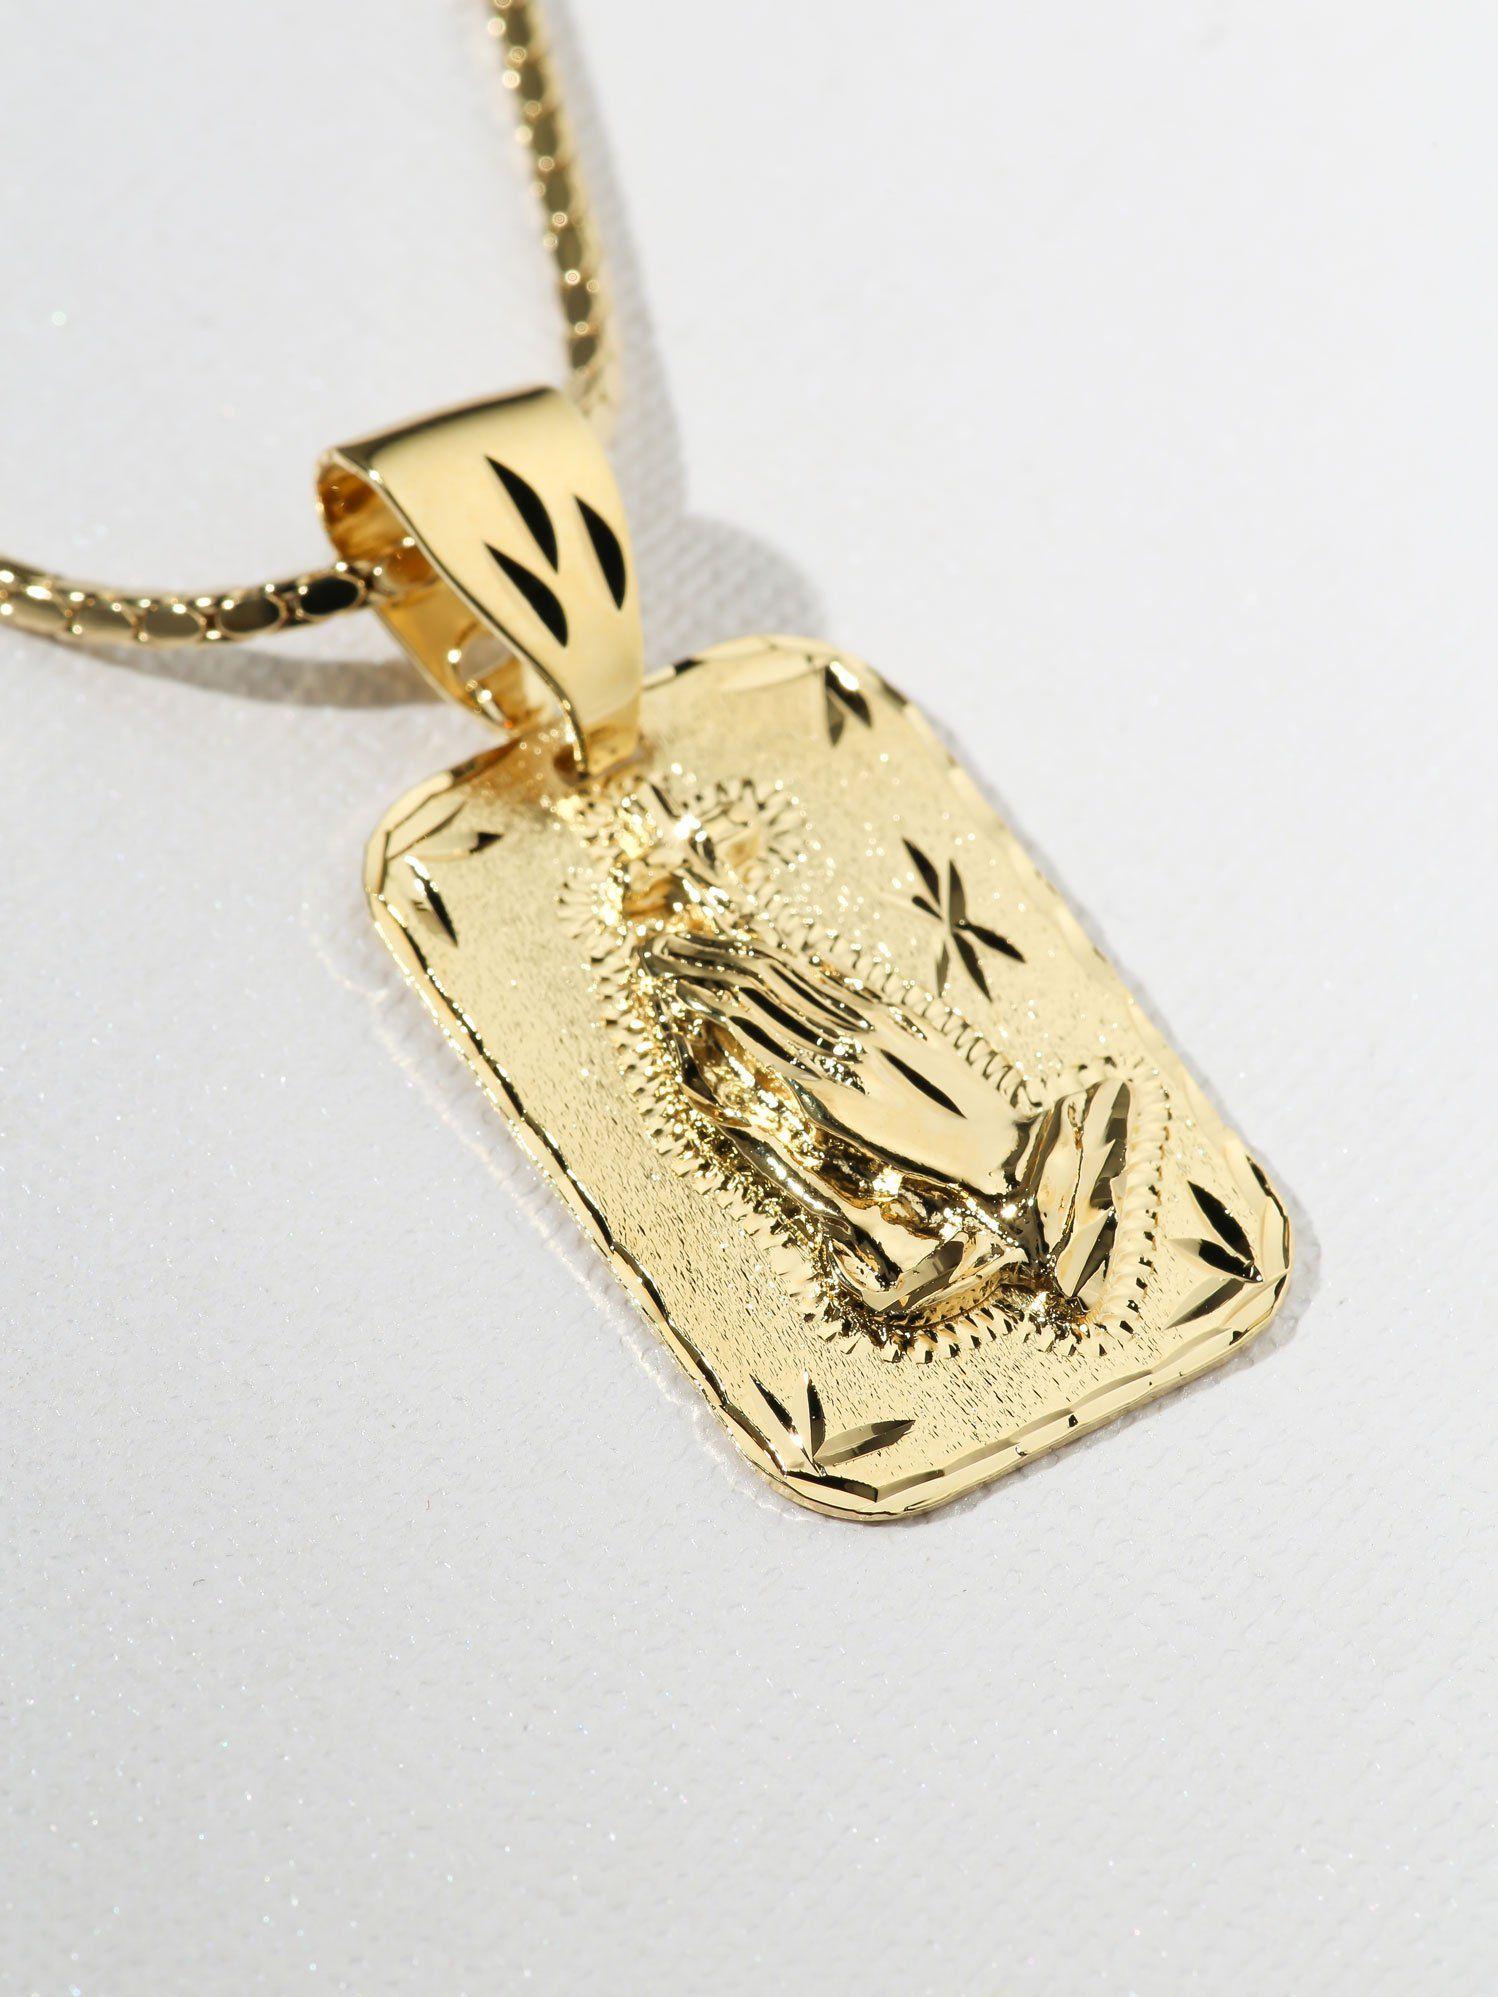 14K Solid Yellow Rose Gold Praying Hands Pendant Polish Necklace Charm Women Men